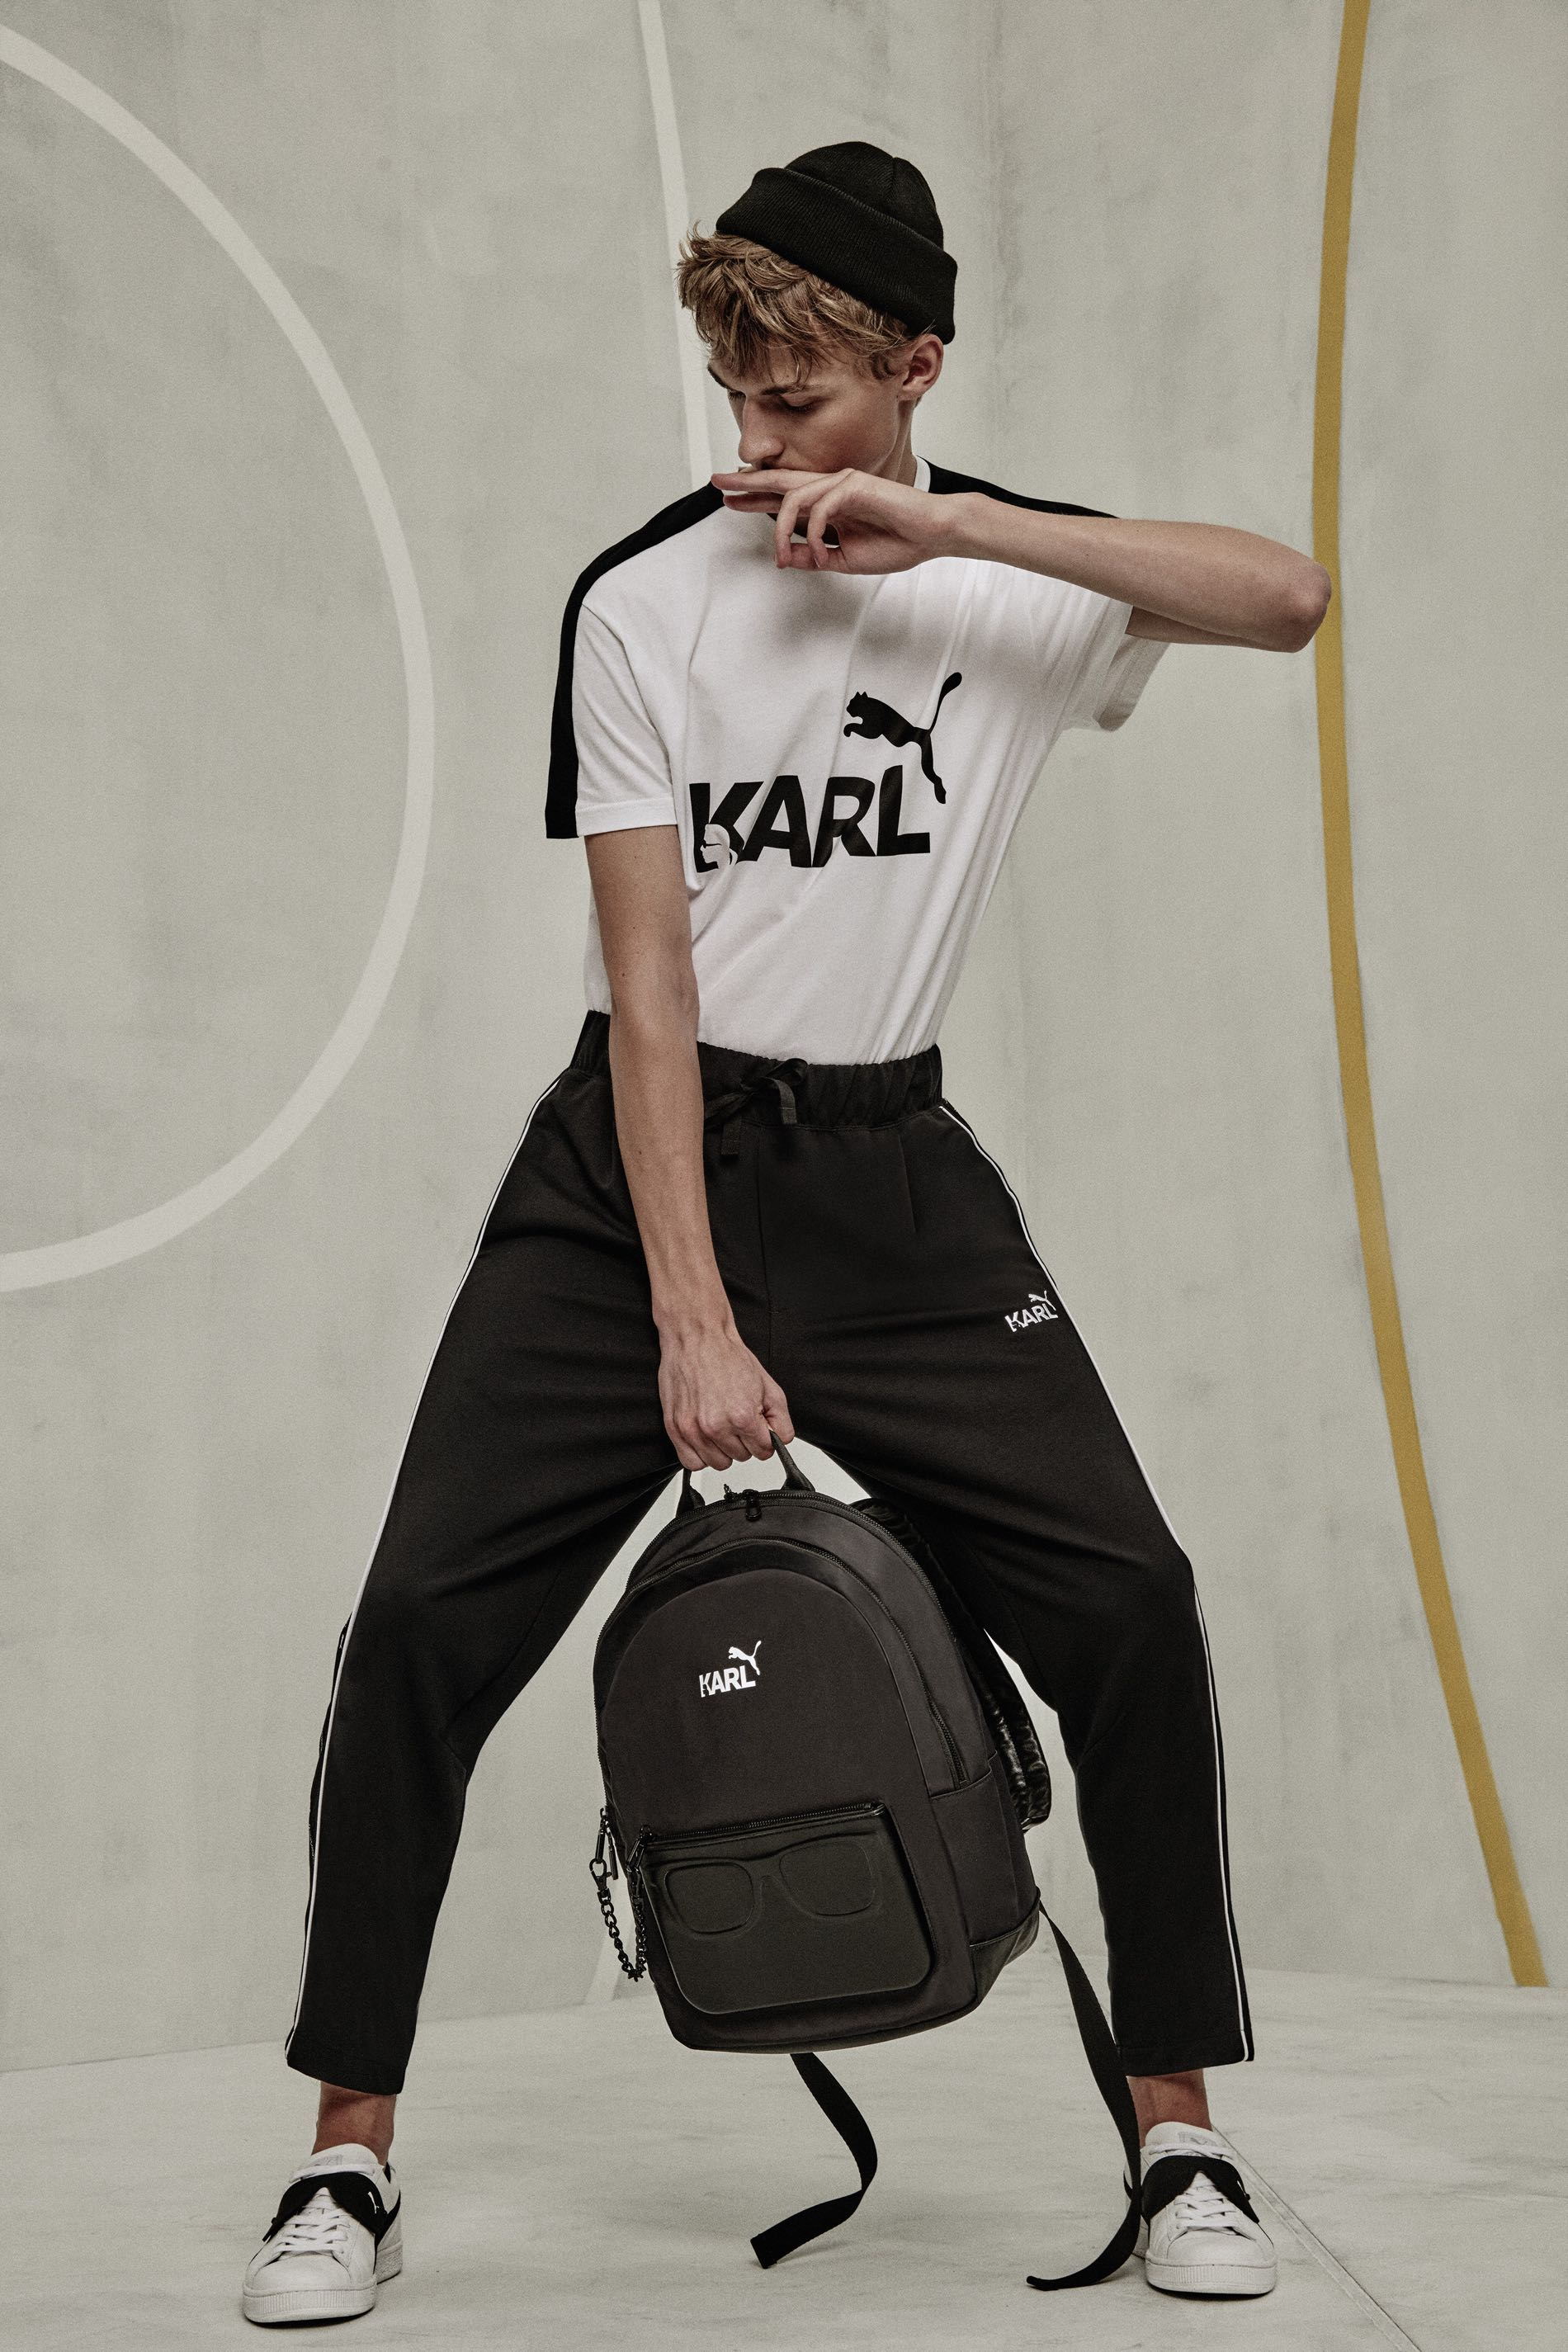 Puma-Suede-Classic-x-Karl-Lagerfeld-2-Puma-White-Black-08